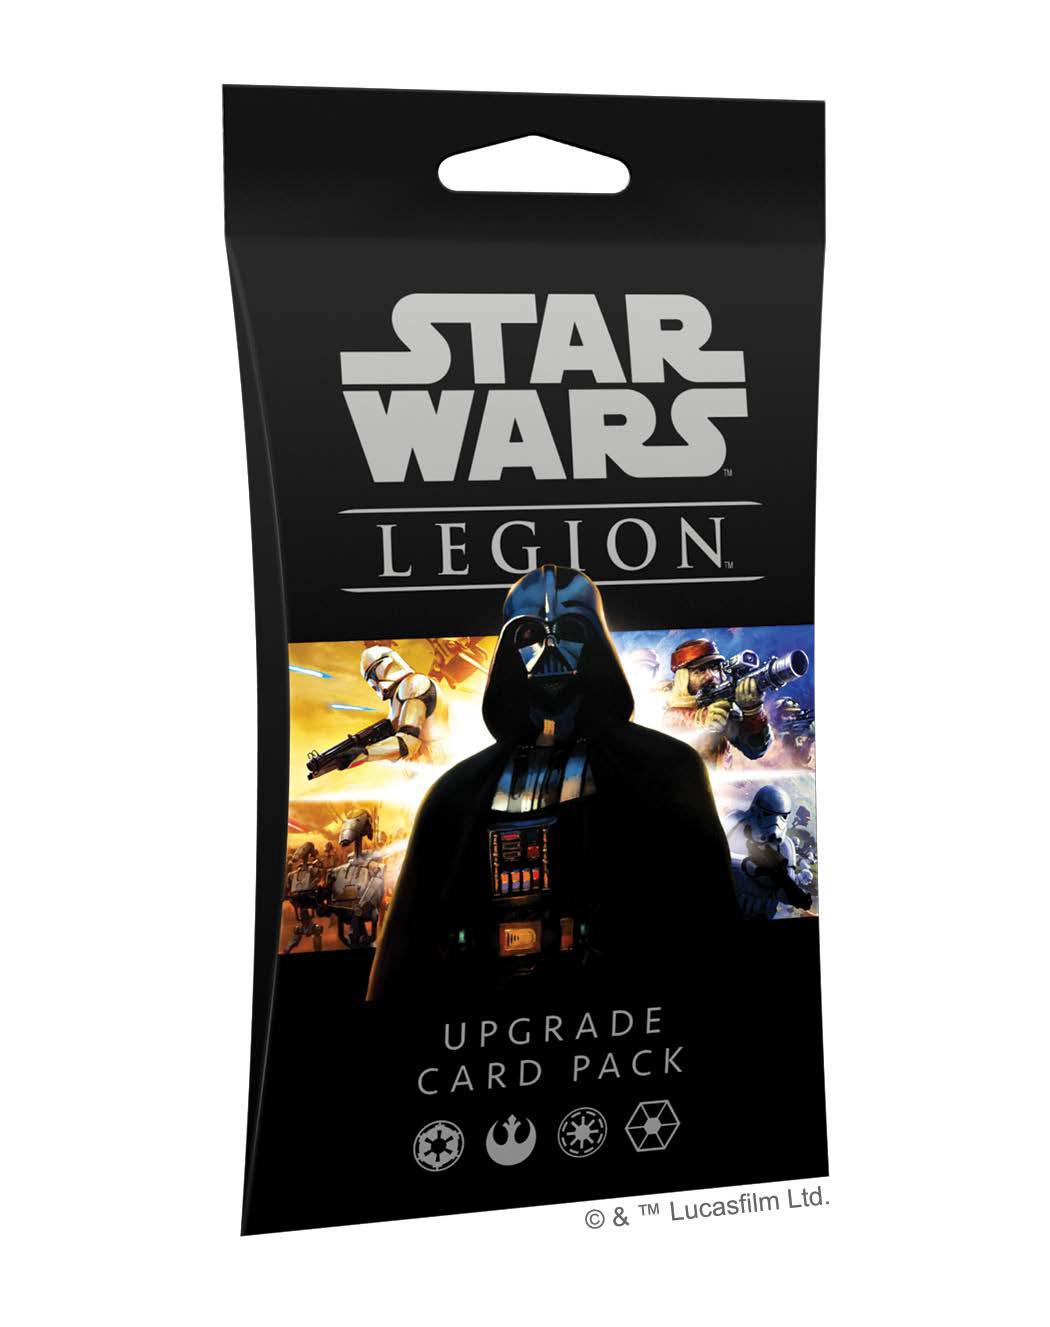 Star Wars: Legion - Upgrade Card Pack Game Box